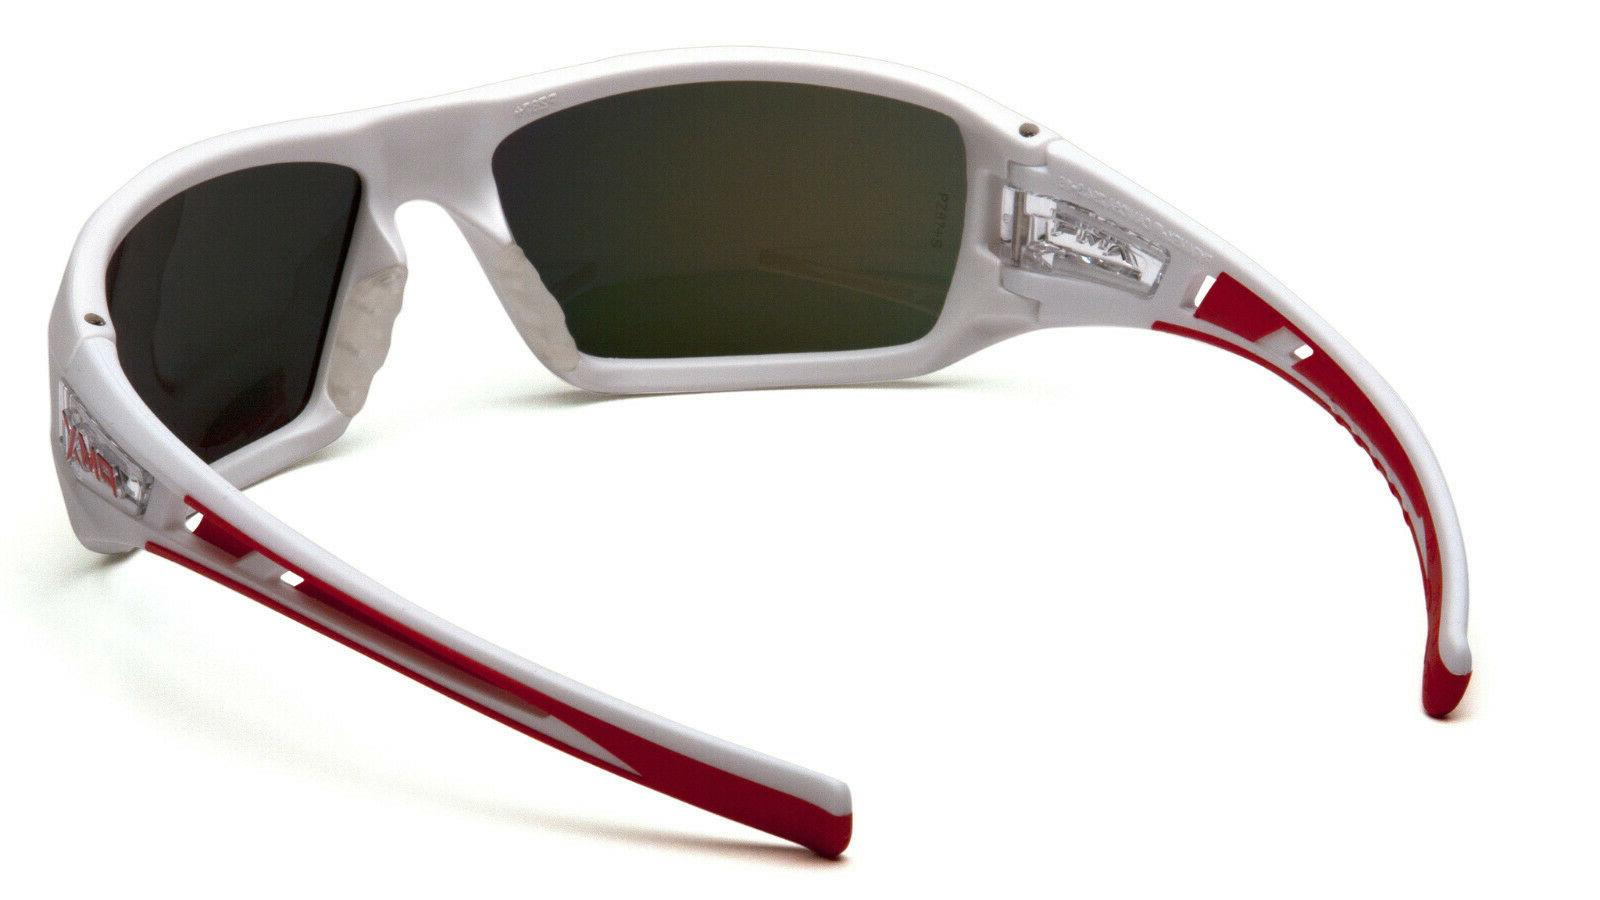 Pyramex Safety Glasses Sunglasses Frame Mirror